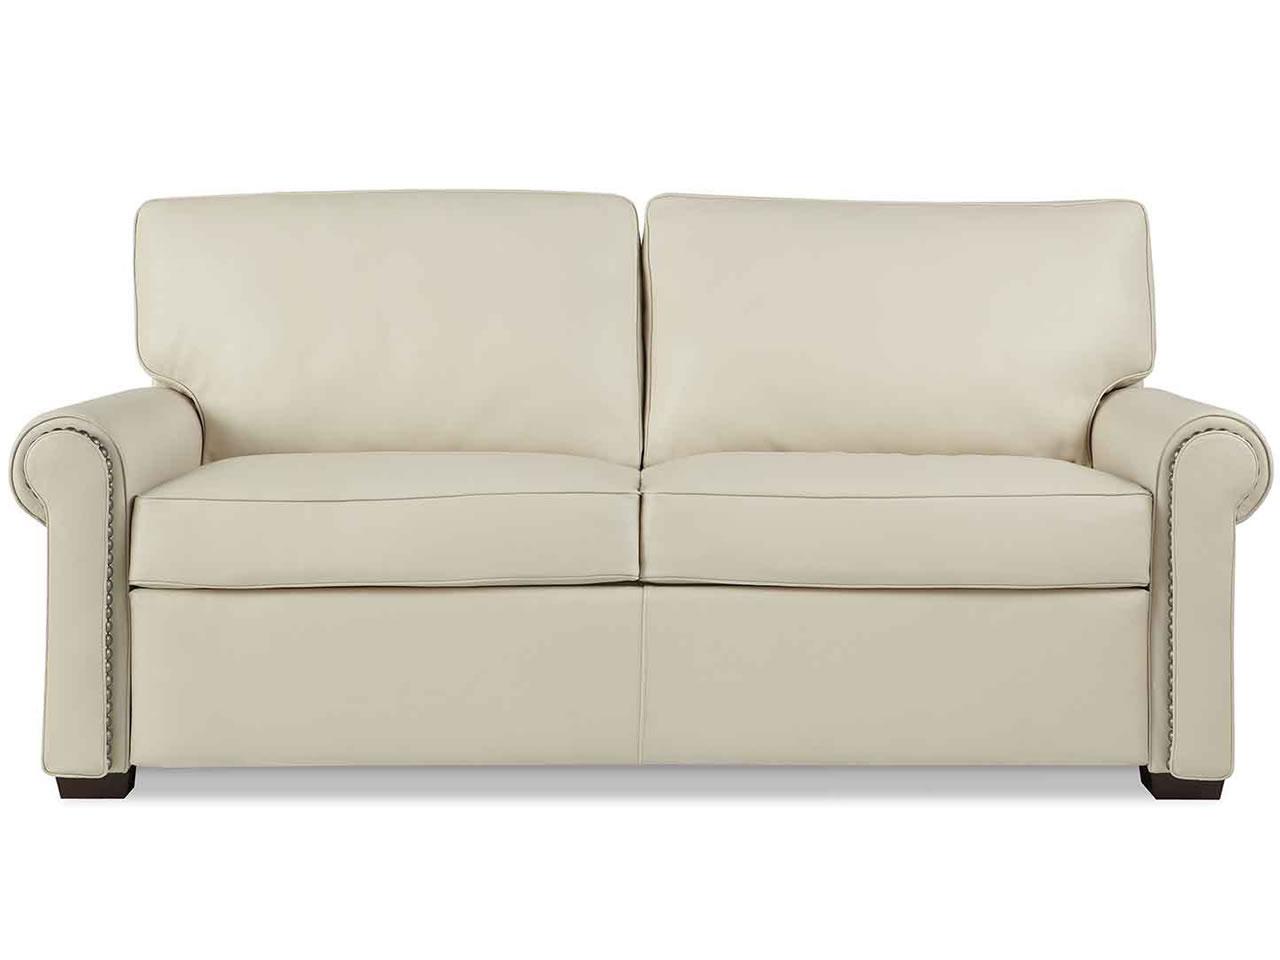 Pleasant Reese Sleeper Sofa Sofas Chairs Of Minnesota Pdpeps Interior Chair Design Pdpepsorg